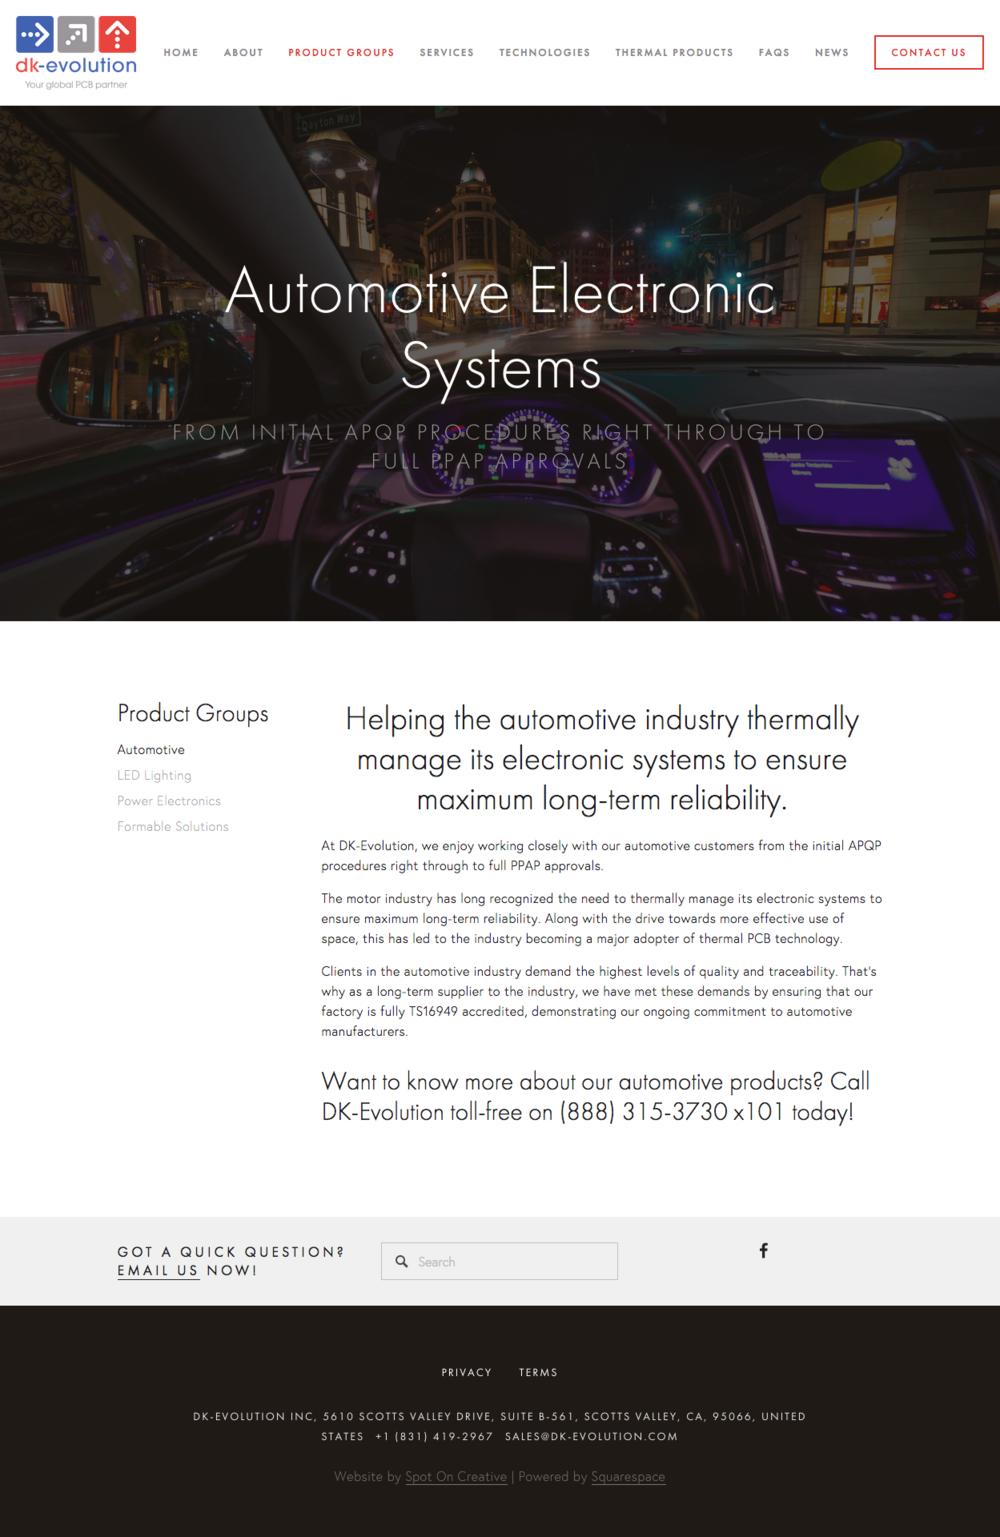 DK-Evolution - product groups - Automotive.png